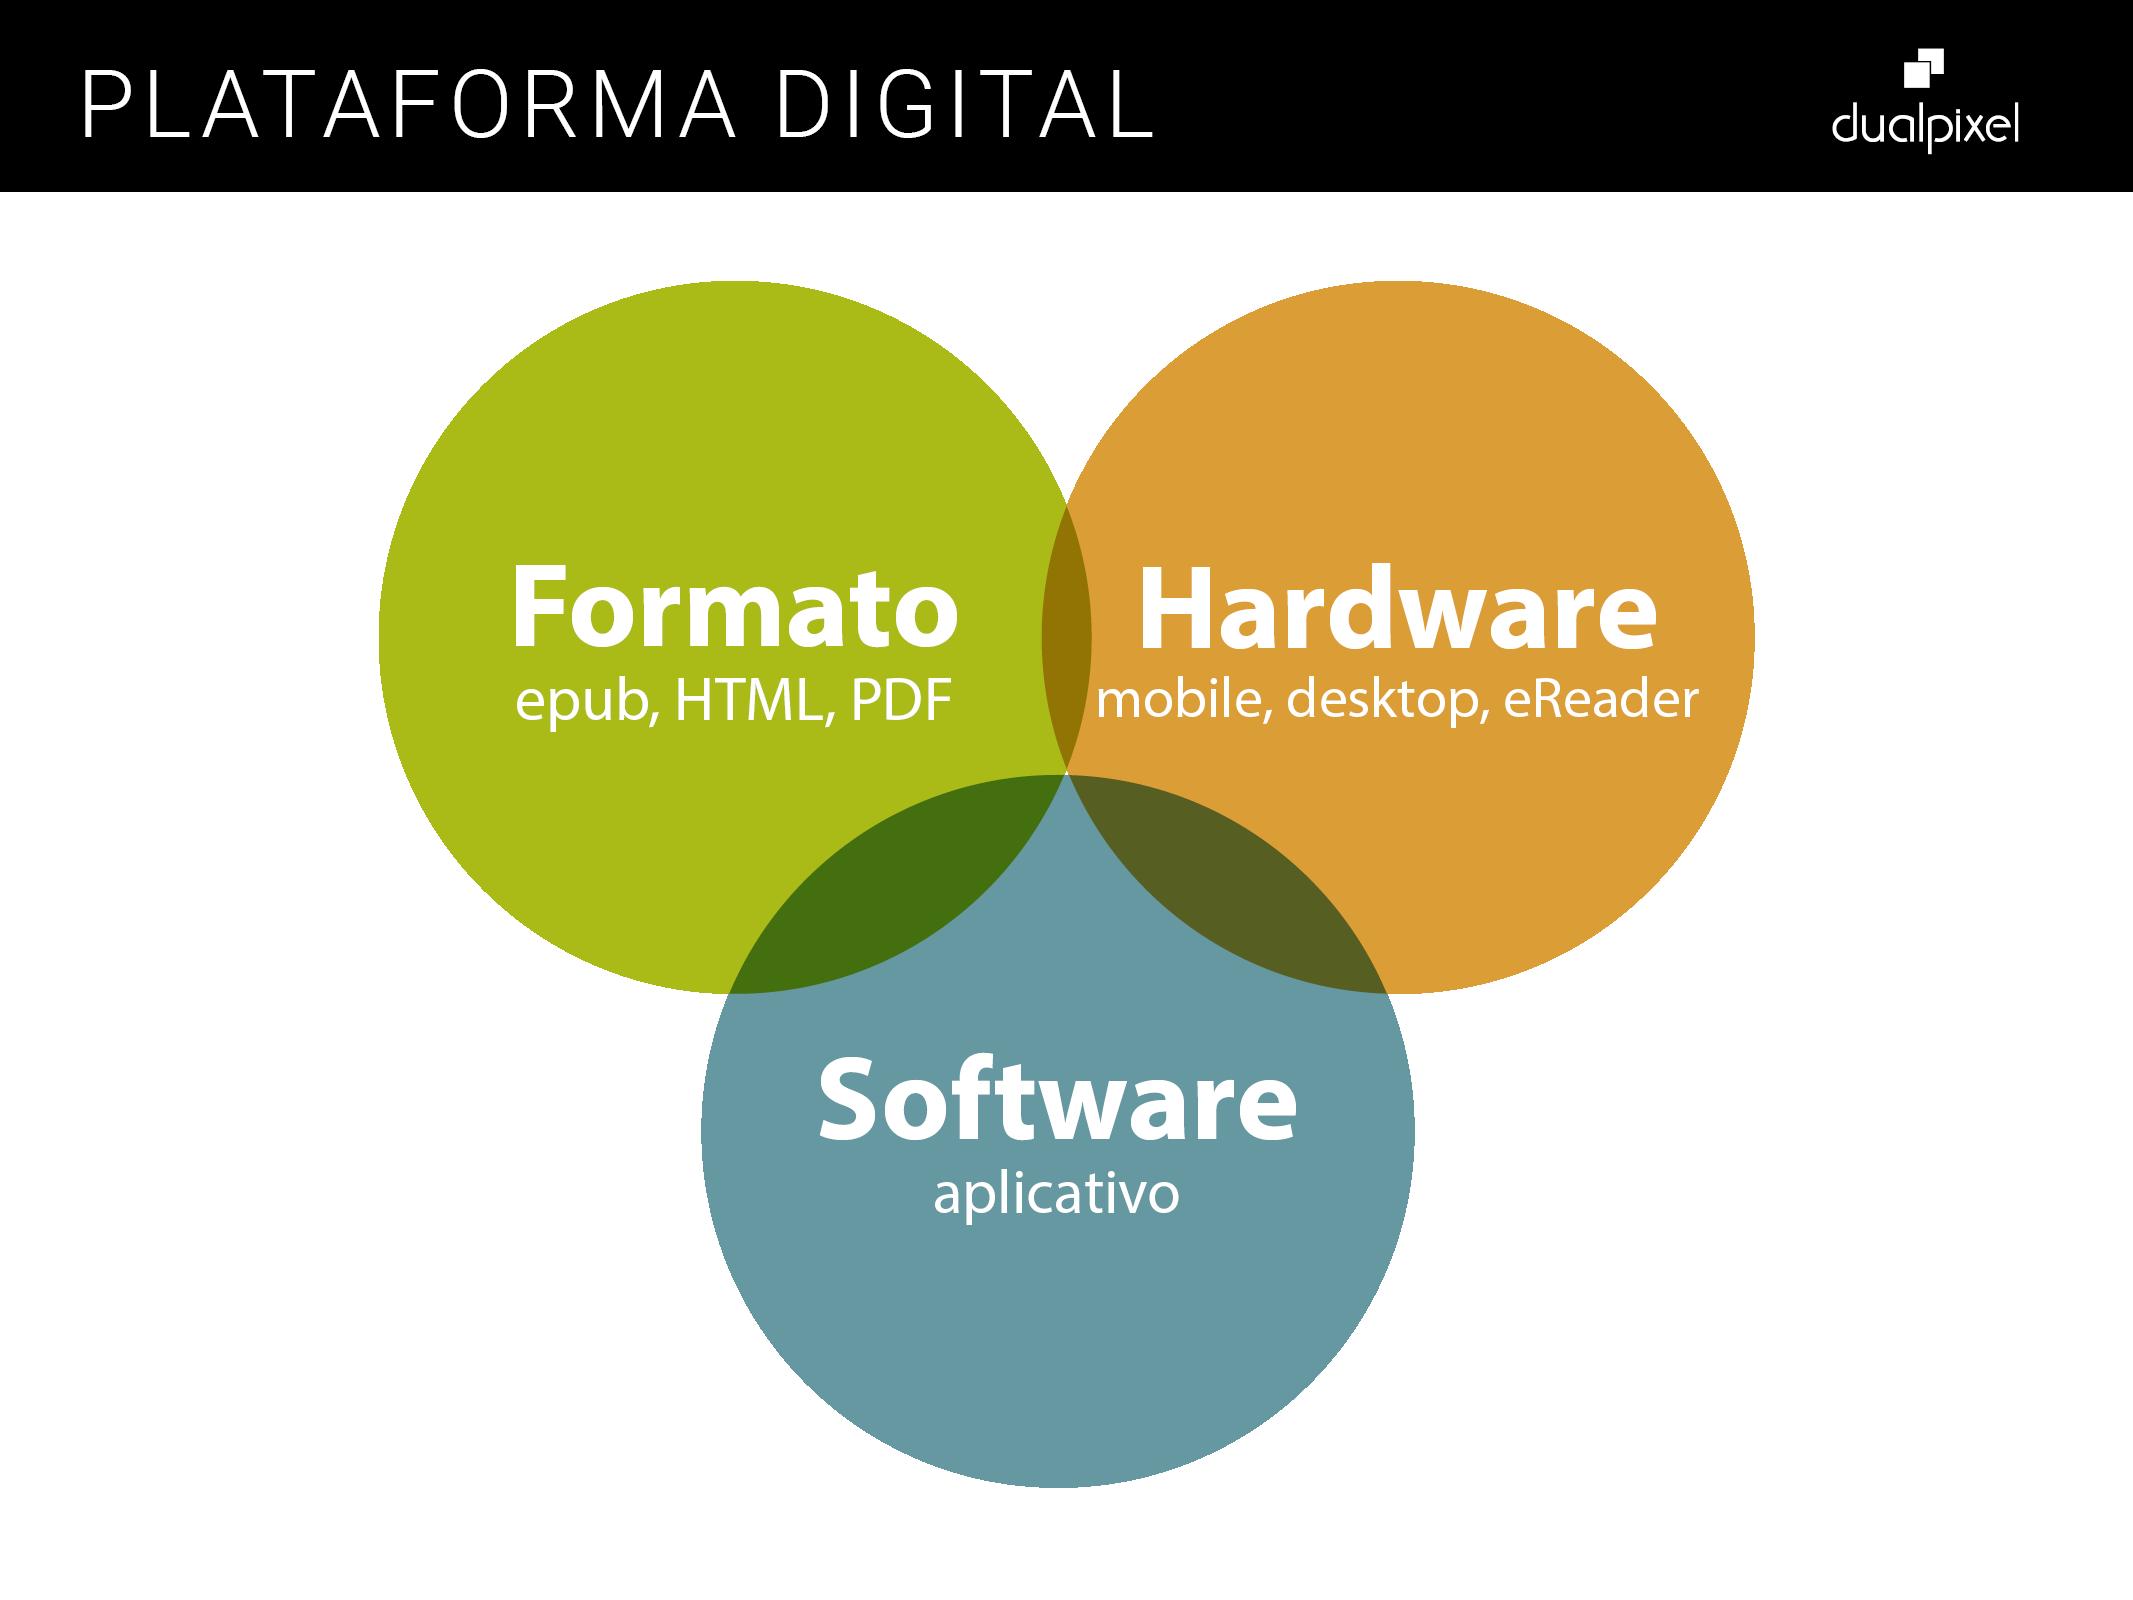 Plataforma Digital - Formato, Hardware e Software